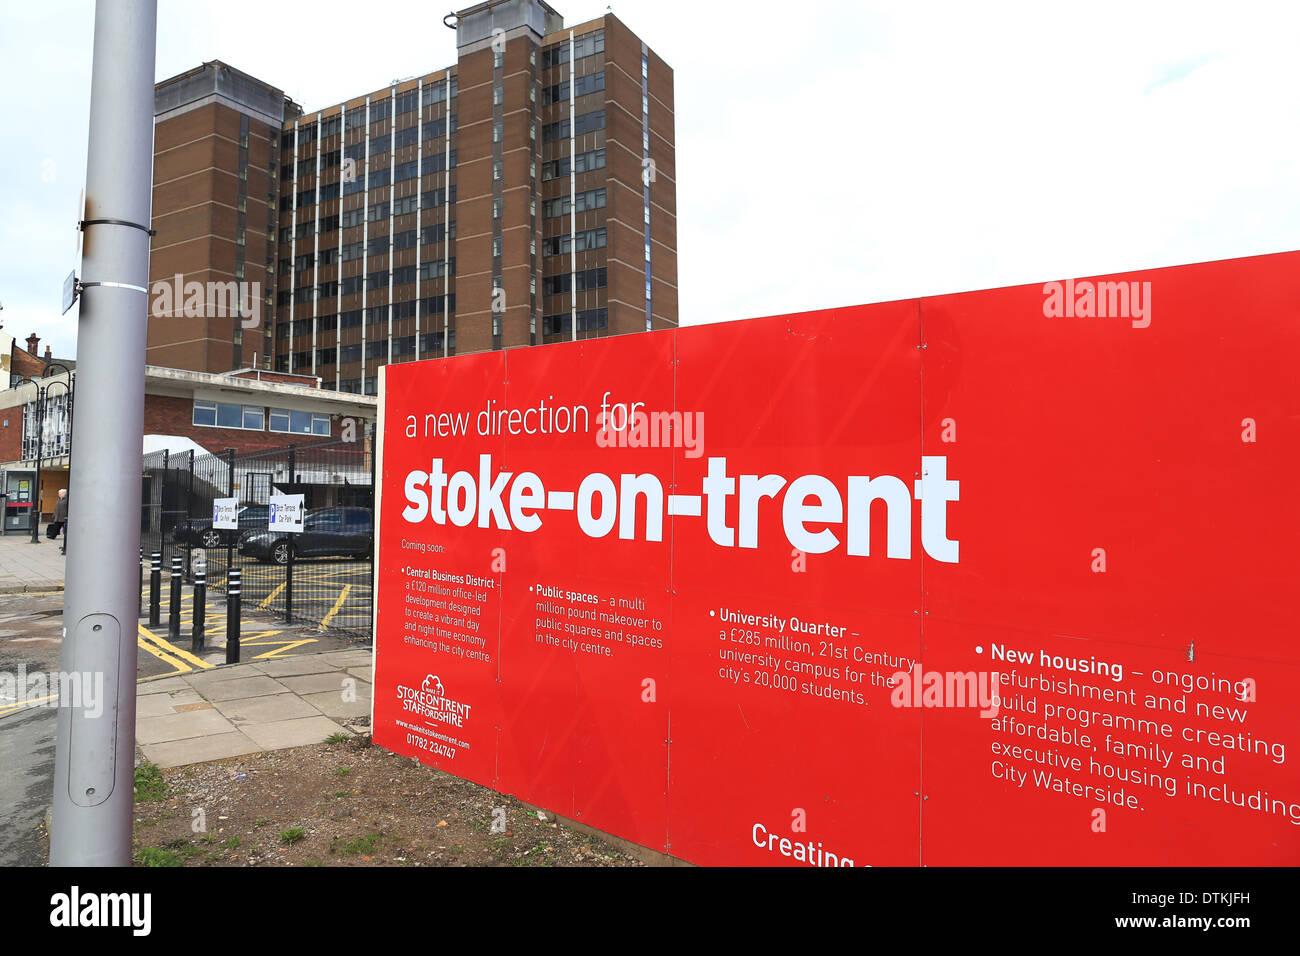 Stoke on Trent City centre, city sentral, hanley - Stock Image